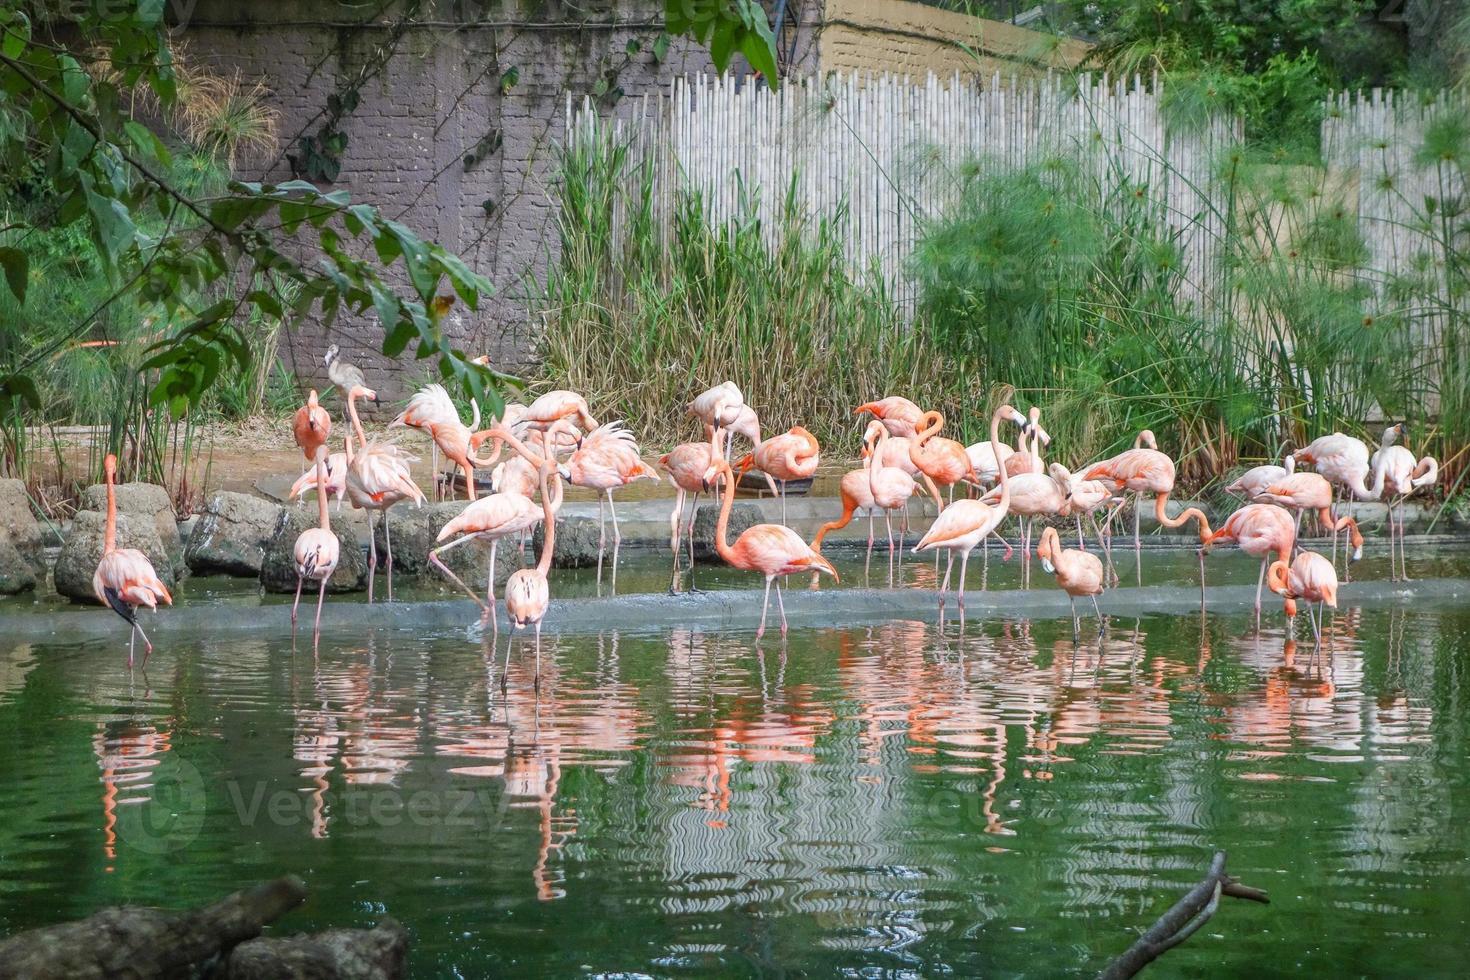 Flamingo birds in a pond photo